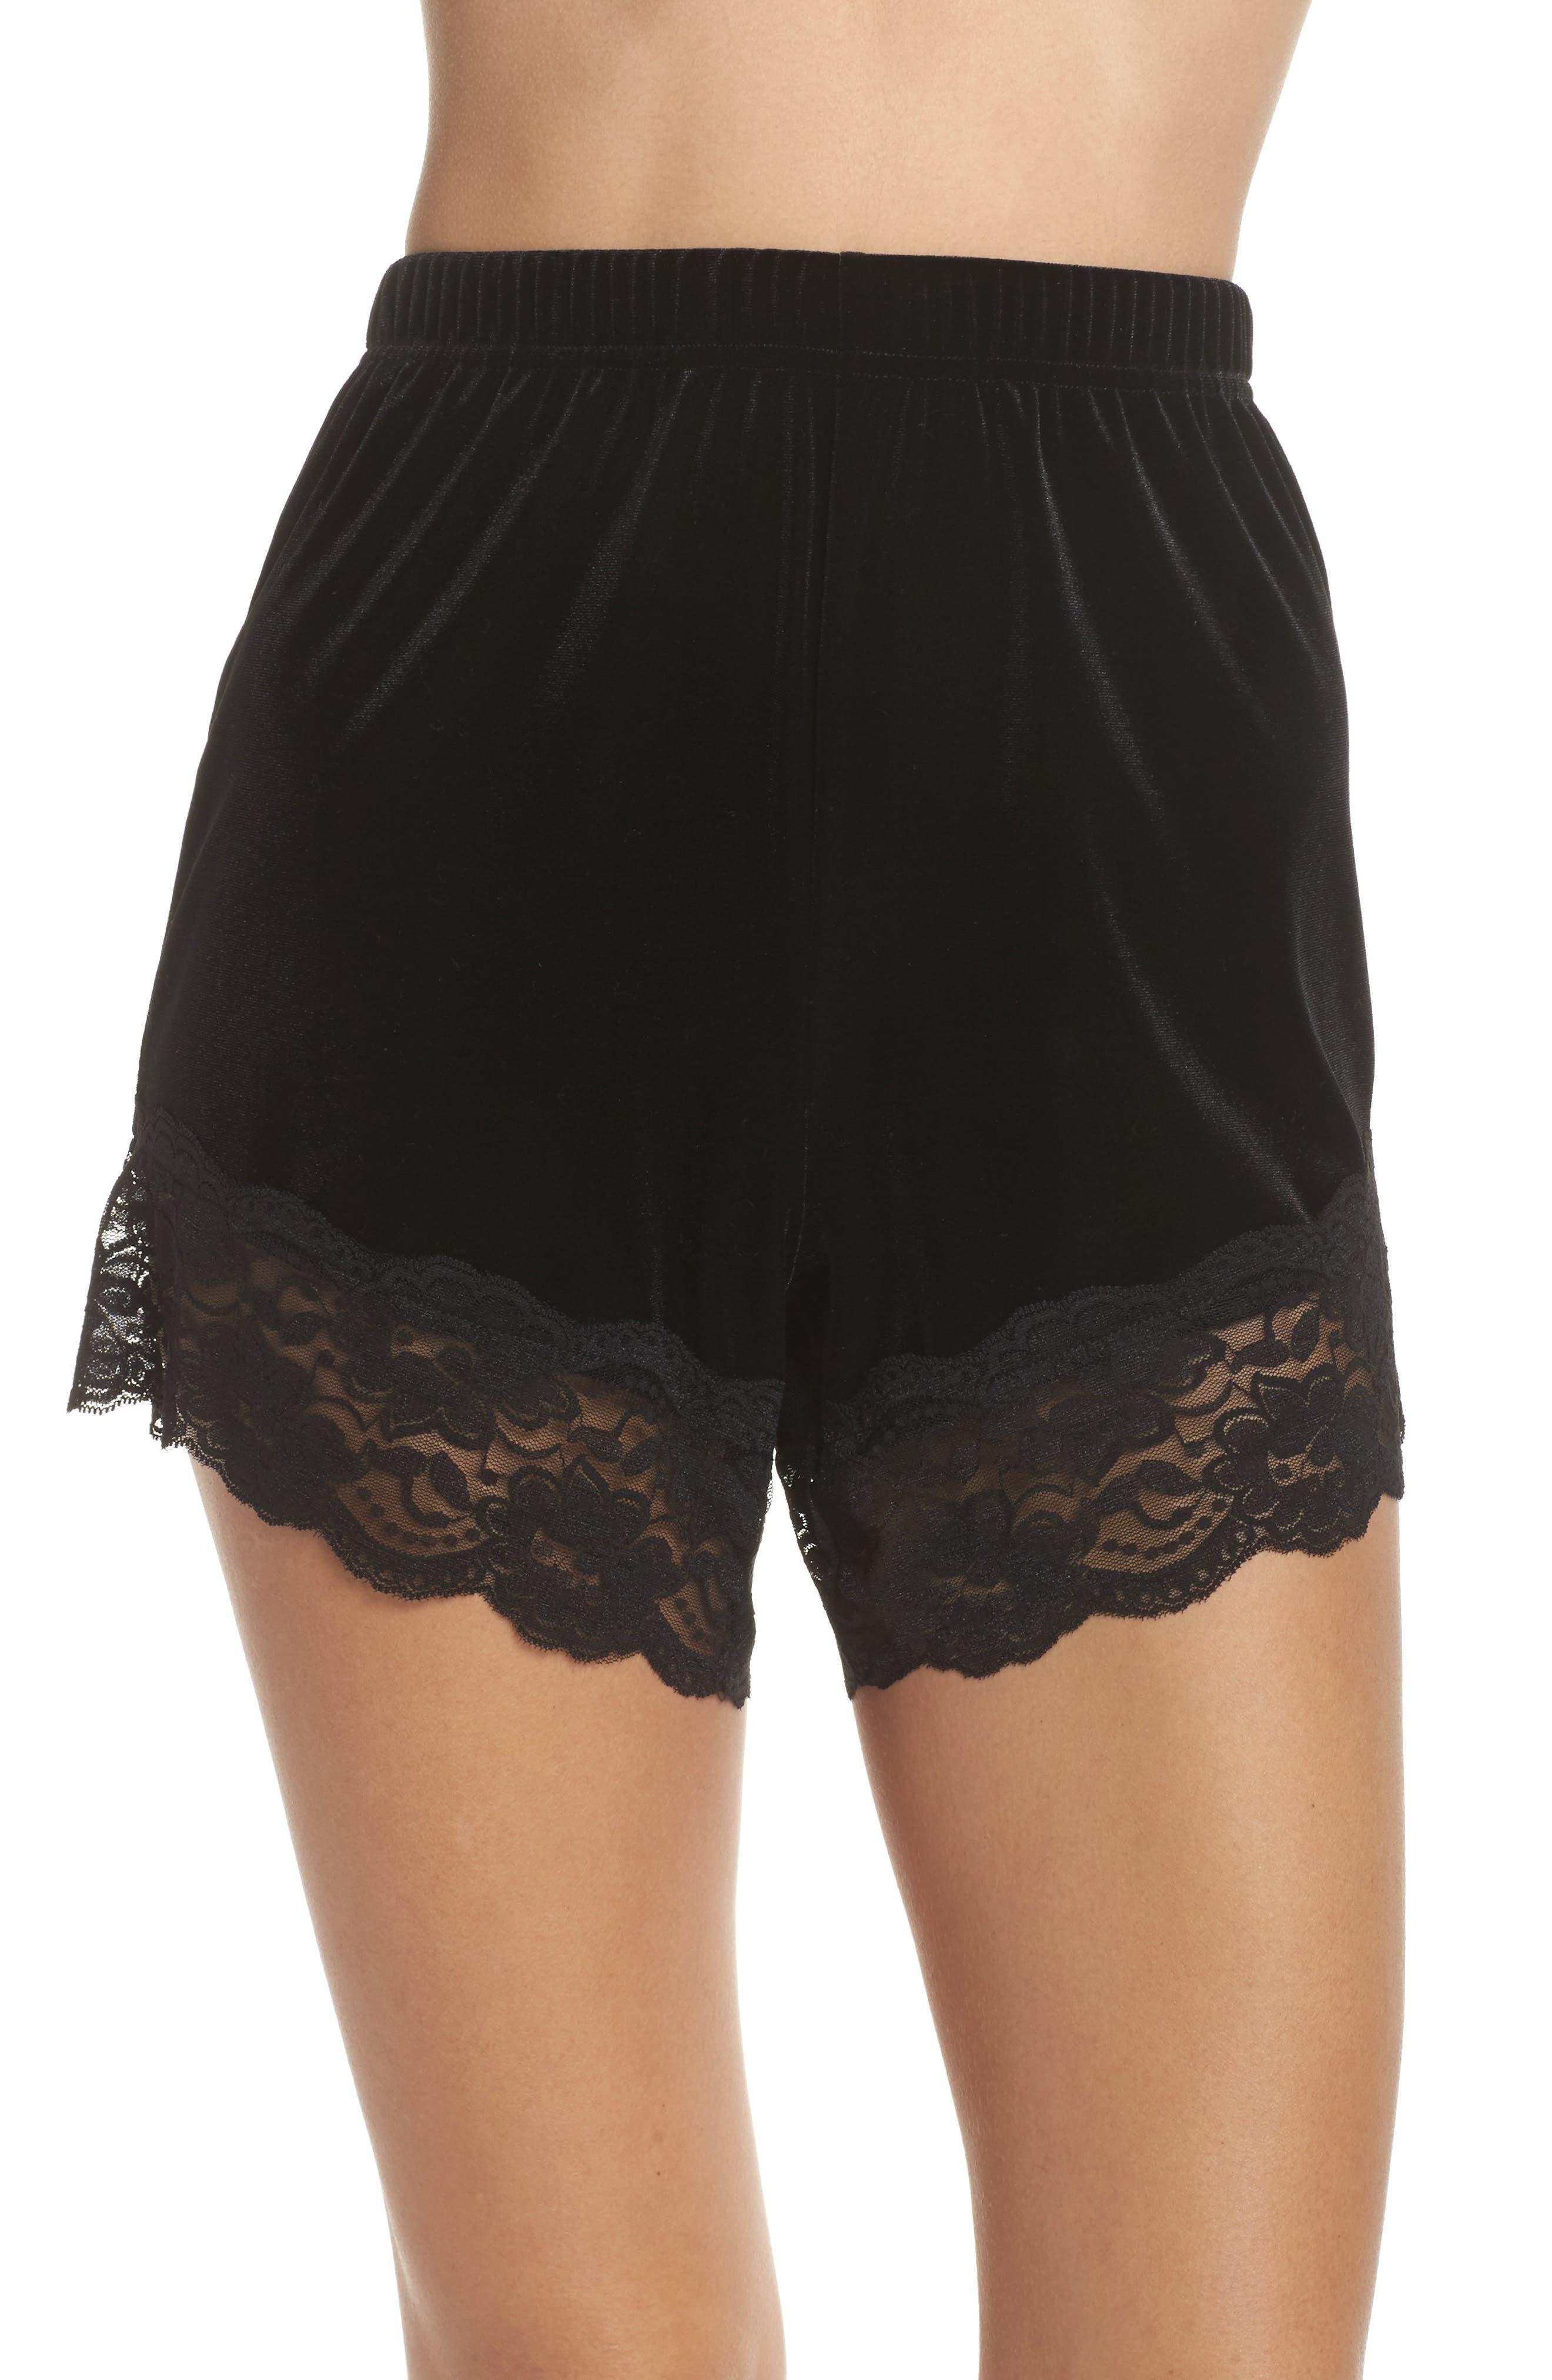 Alternate Image 1 Selected - Topshop Lace Trim Velvet Lounge Shorts